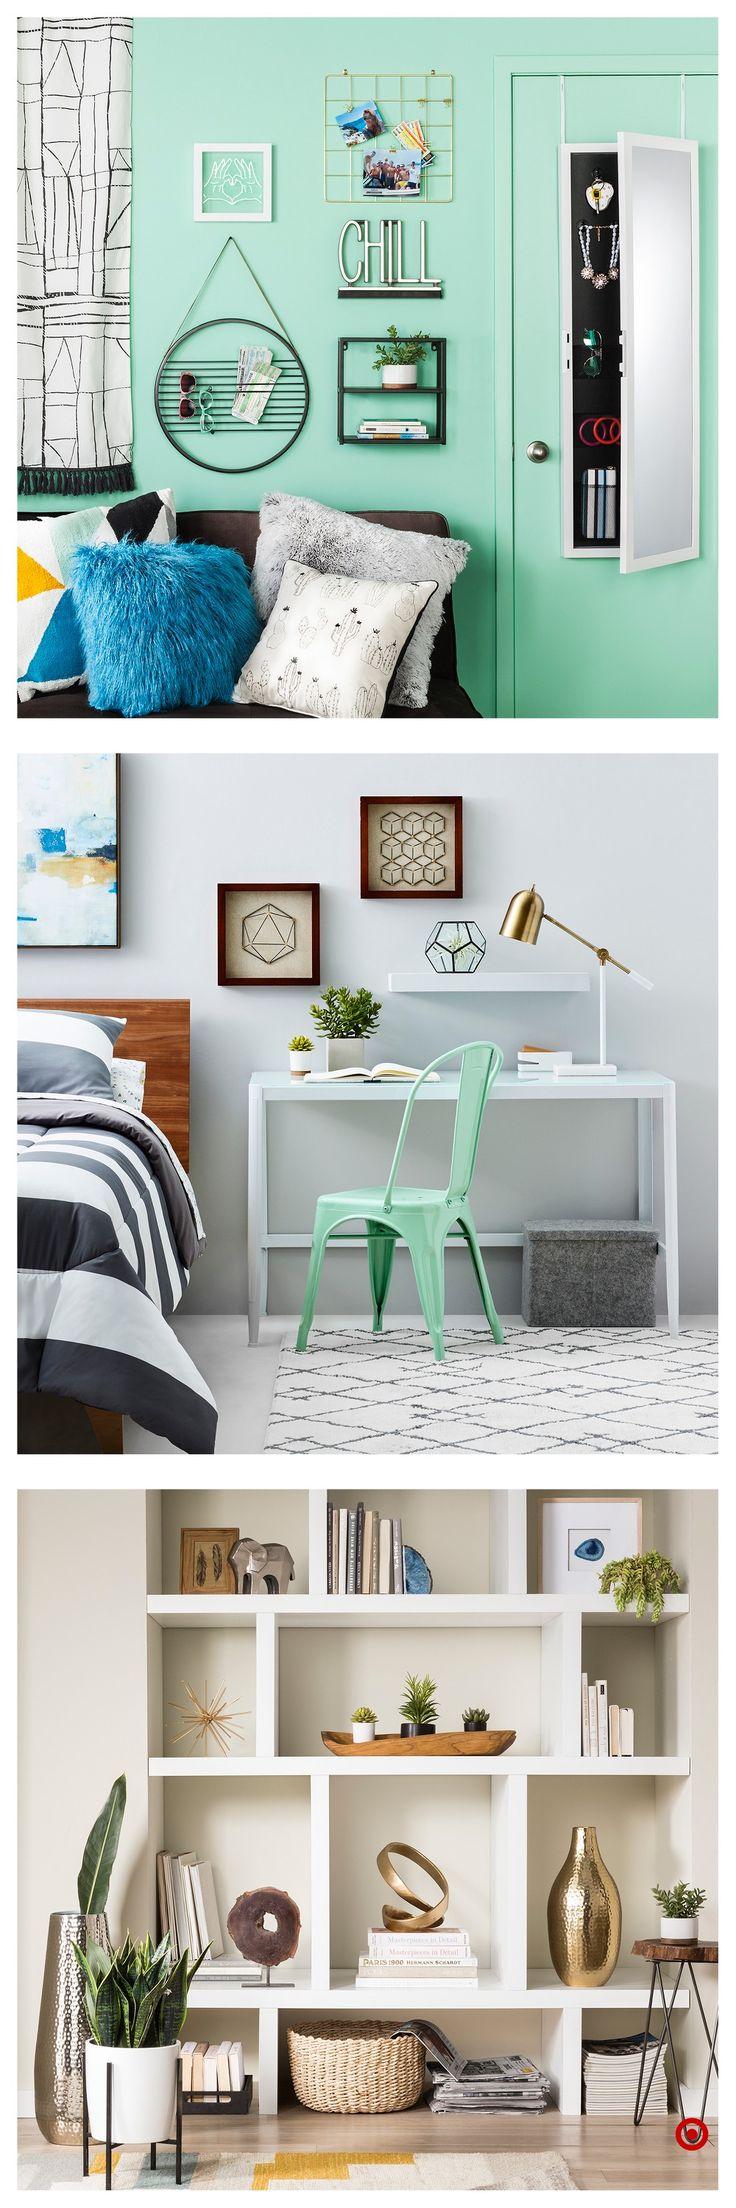 41 Best Room Decor Images On Pinterest Bedroom Ideas Cute Home  # Muebles Nullius